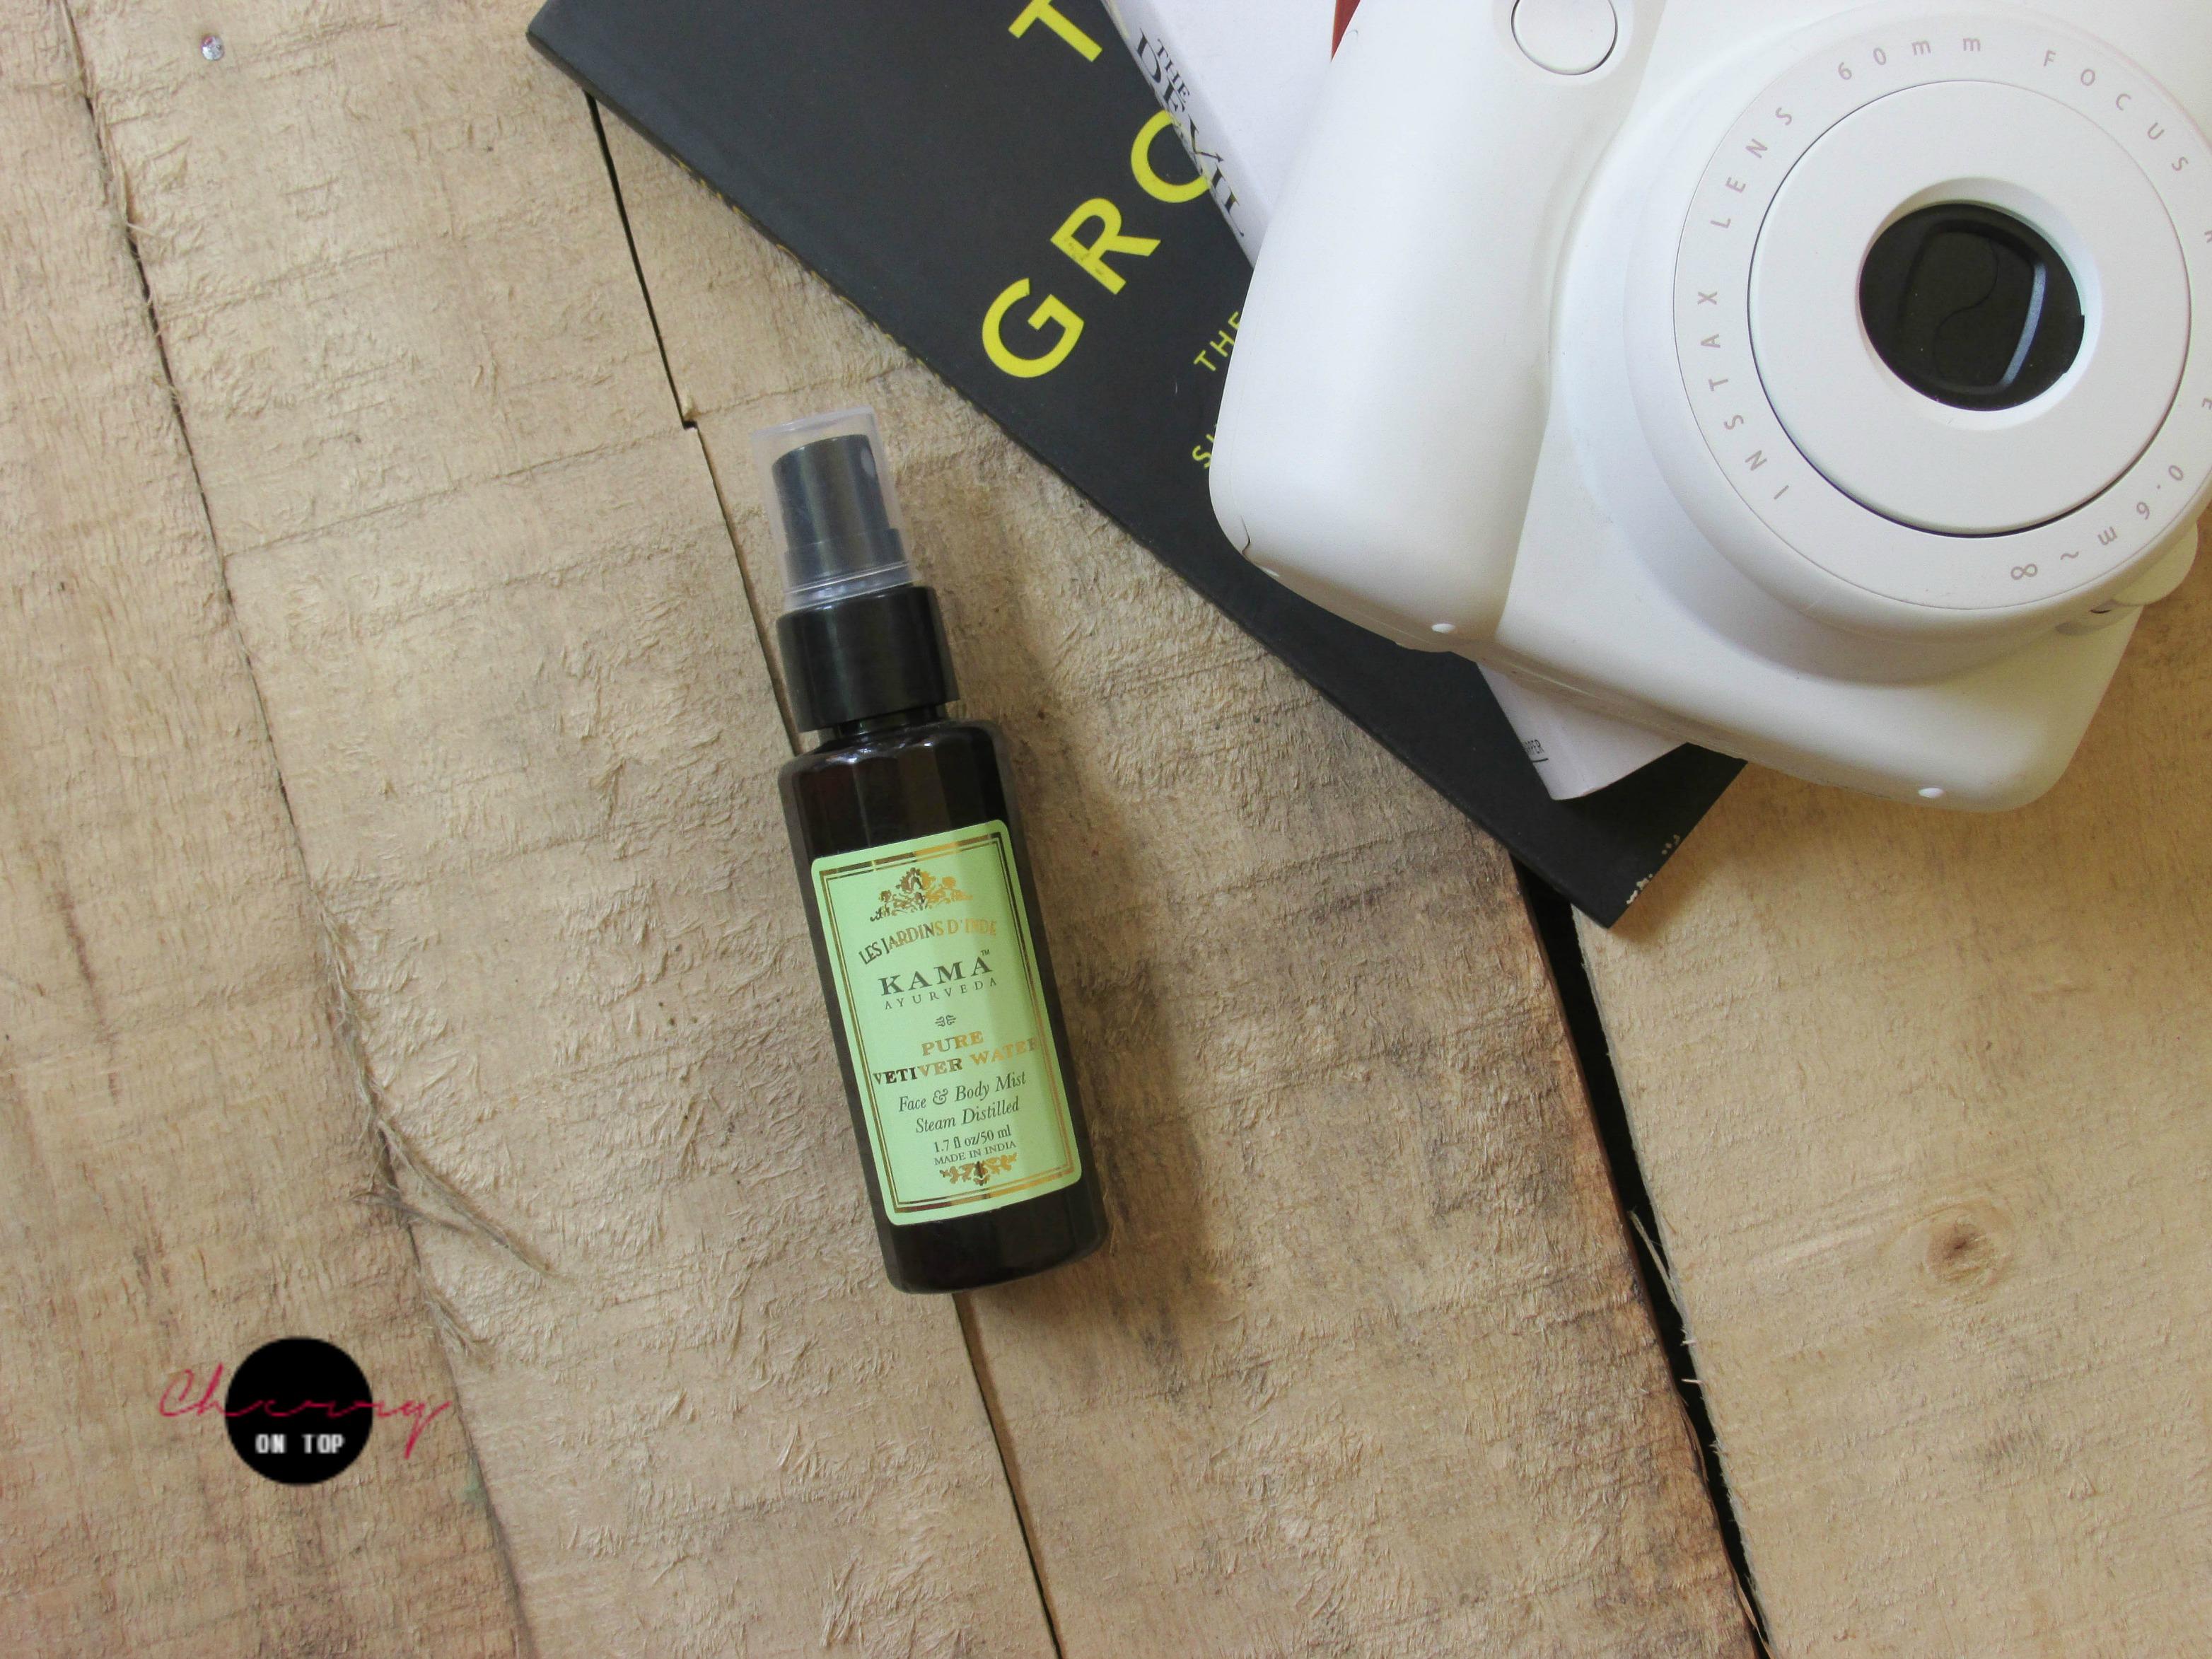 My Everyday Makeup Bag Essentials | Cherry On Top